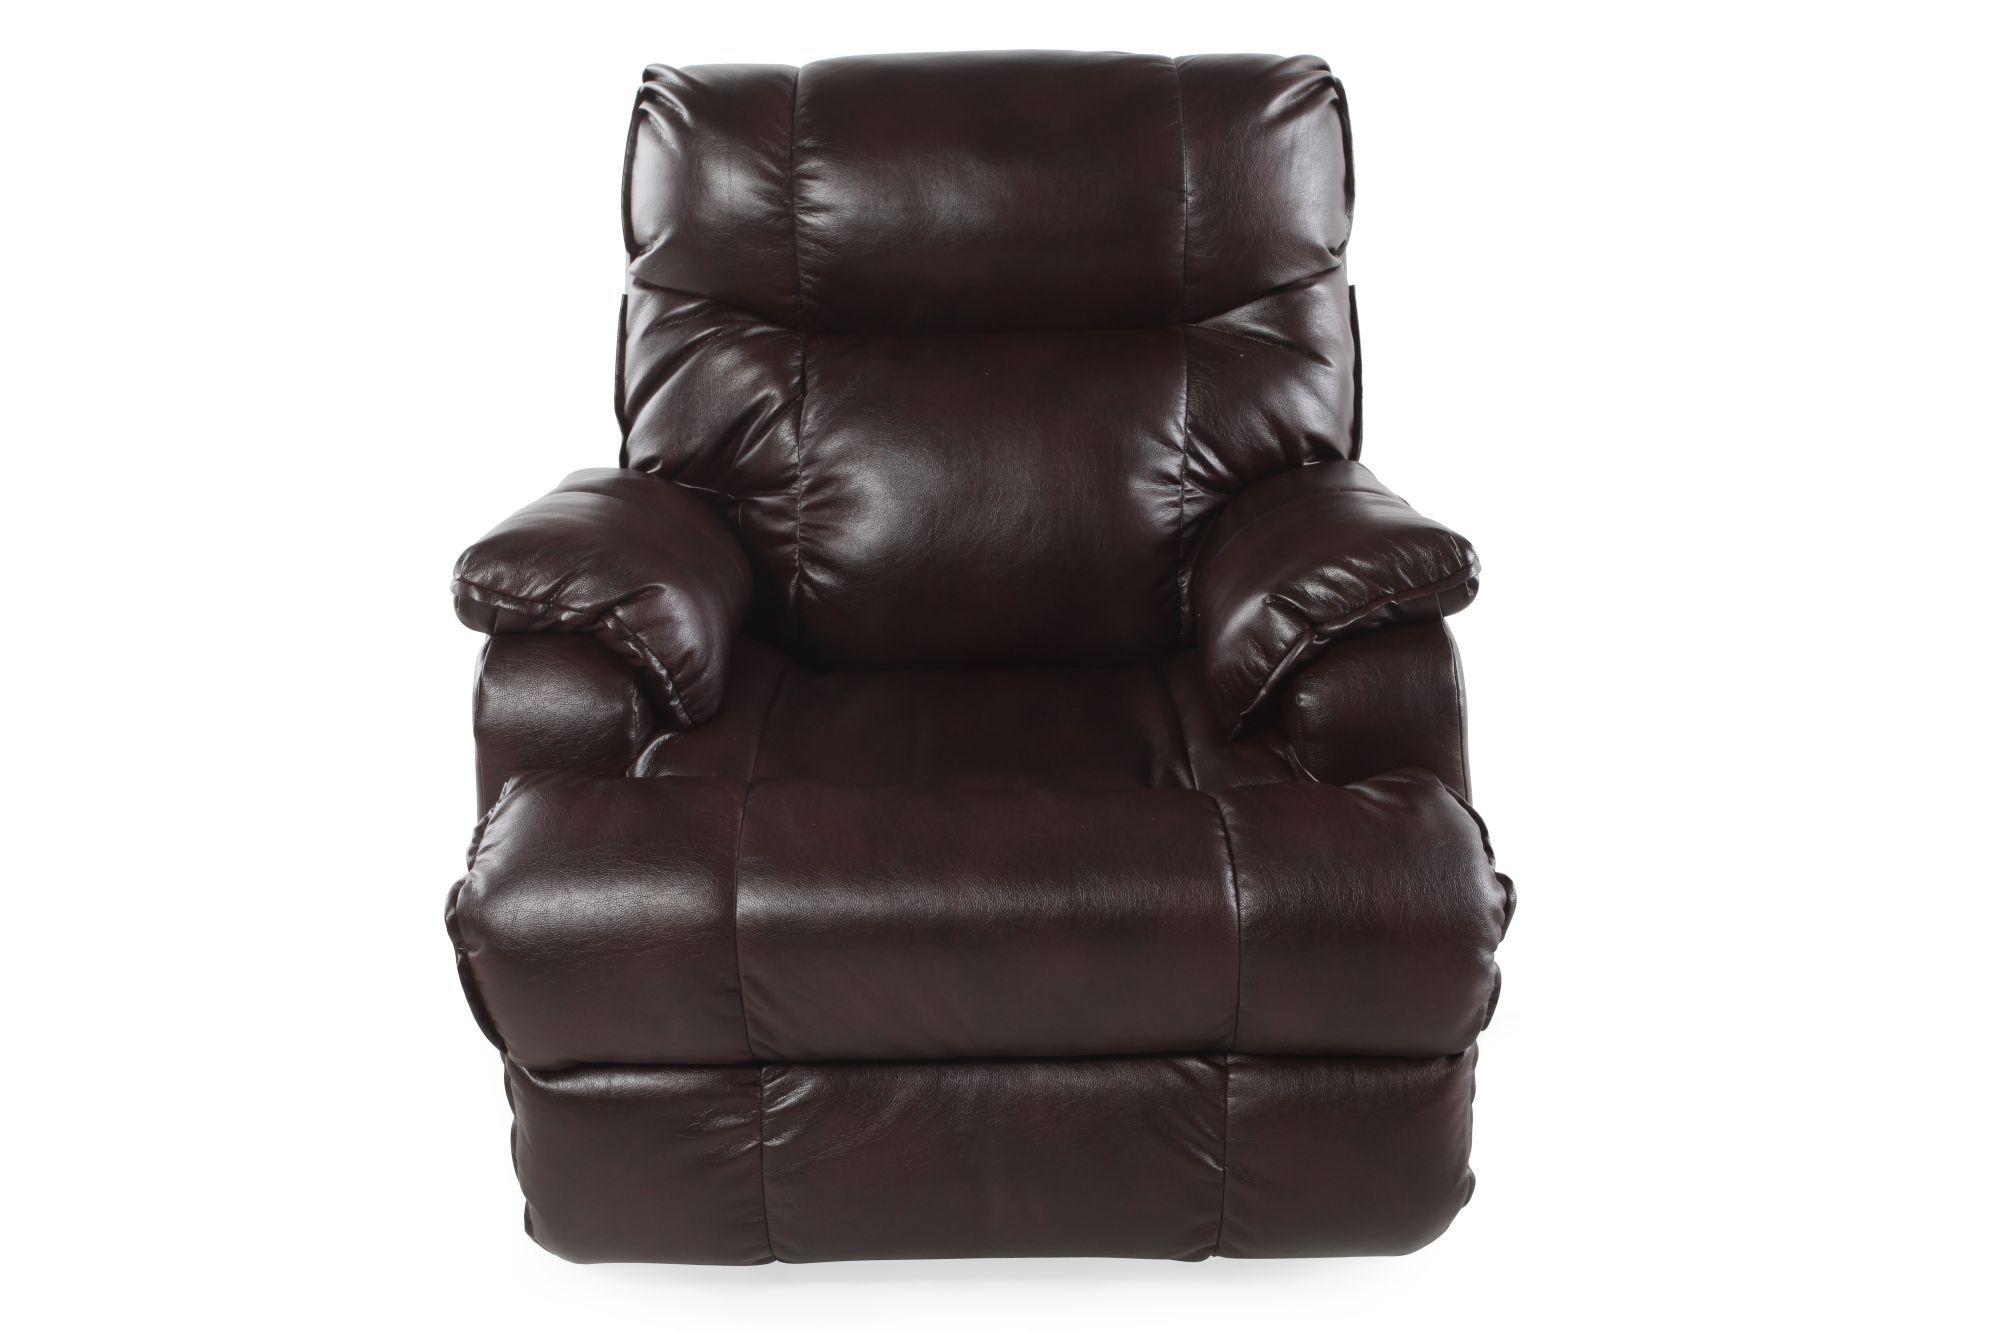 Lane Rancho Coffee Rocker Recliner ...  sc 1 st  Mathis Brothers & Lane Furniture | Mathis Brothers Furniture islam-shia.org